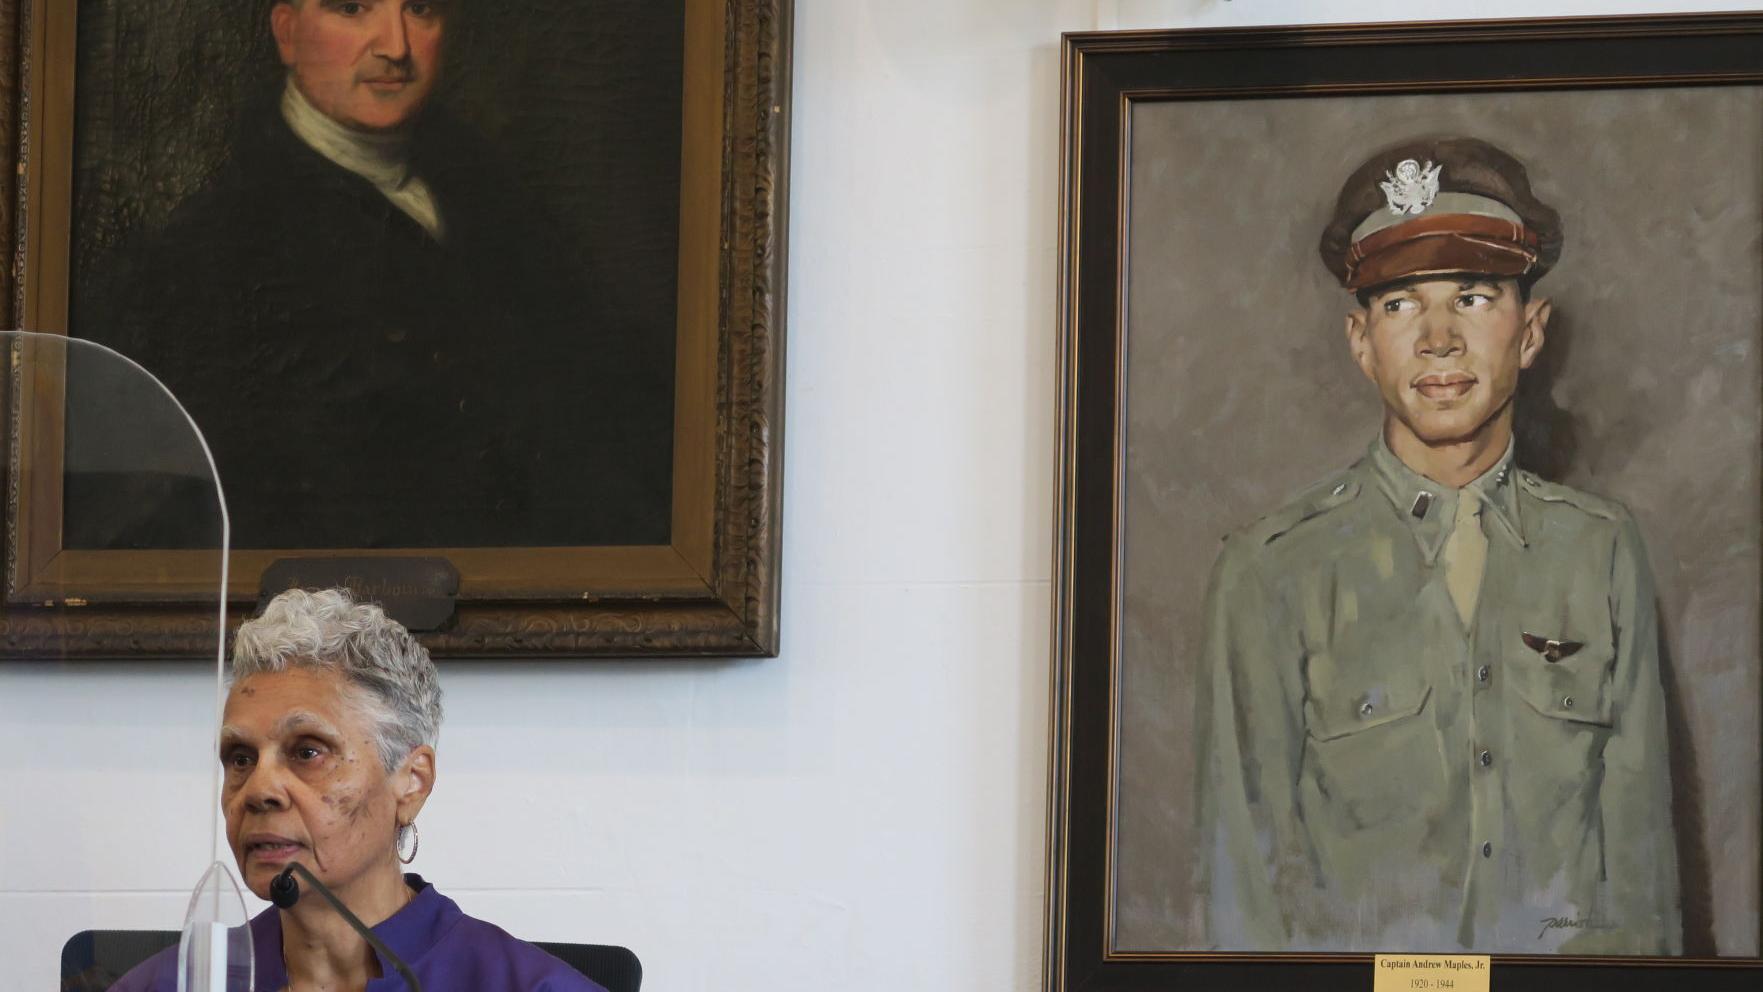 'Unbroken line of patriots': Orange unveils Tuskegee airman's portrait